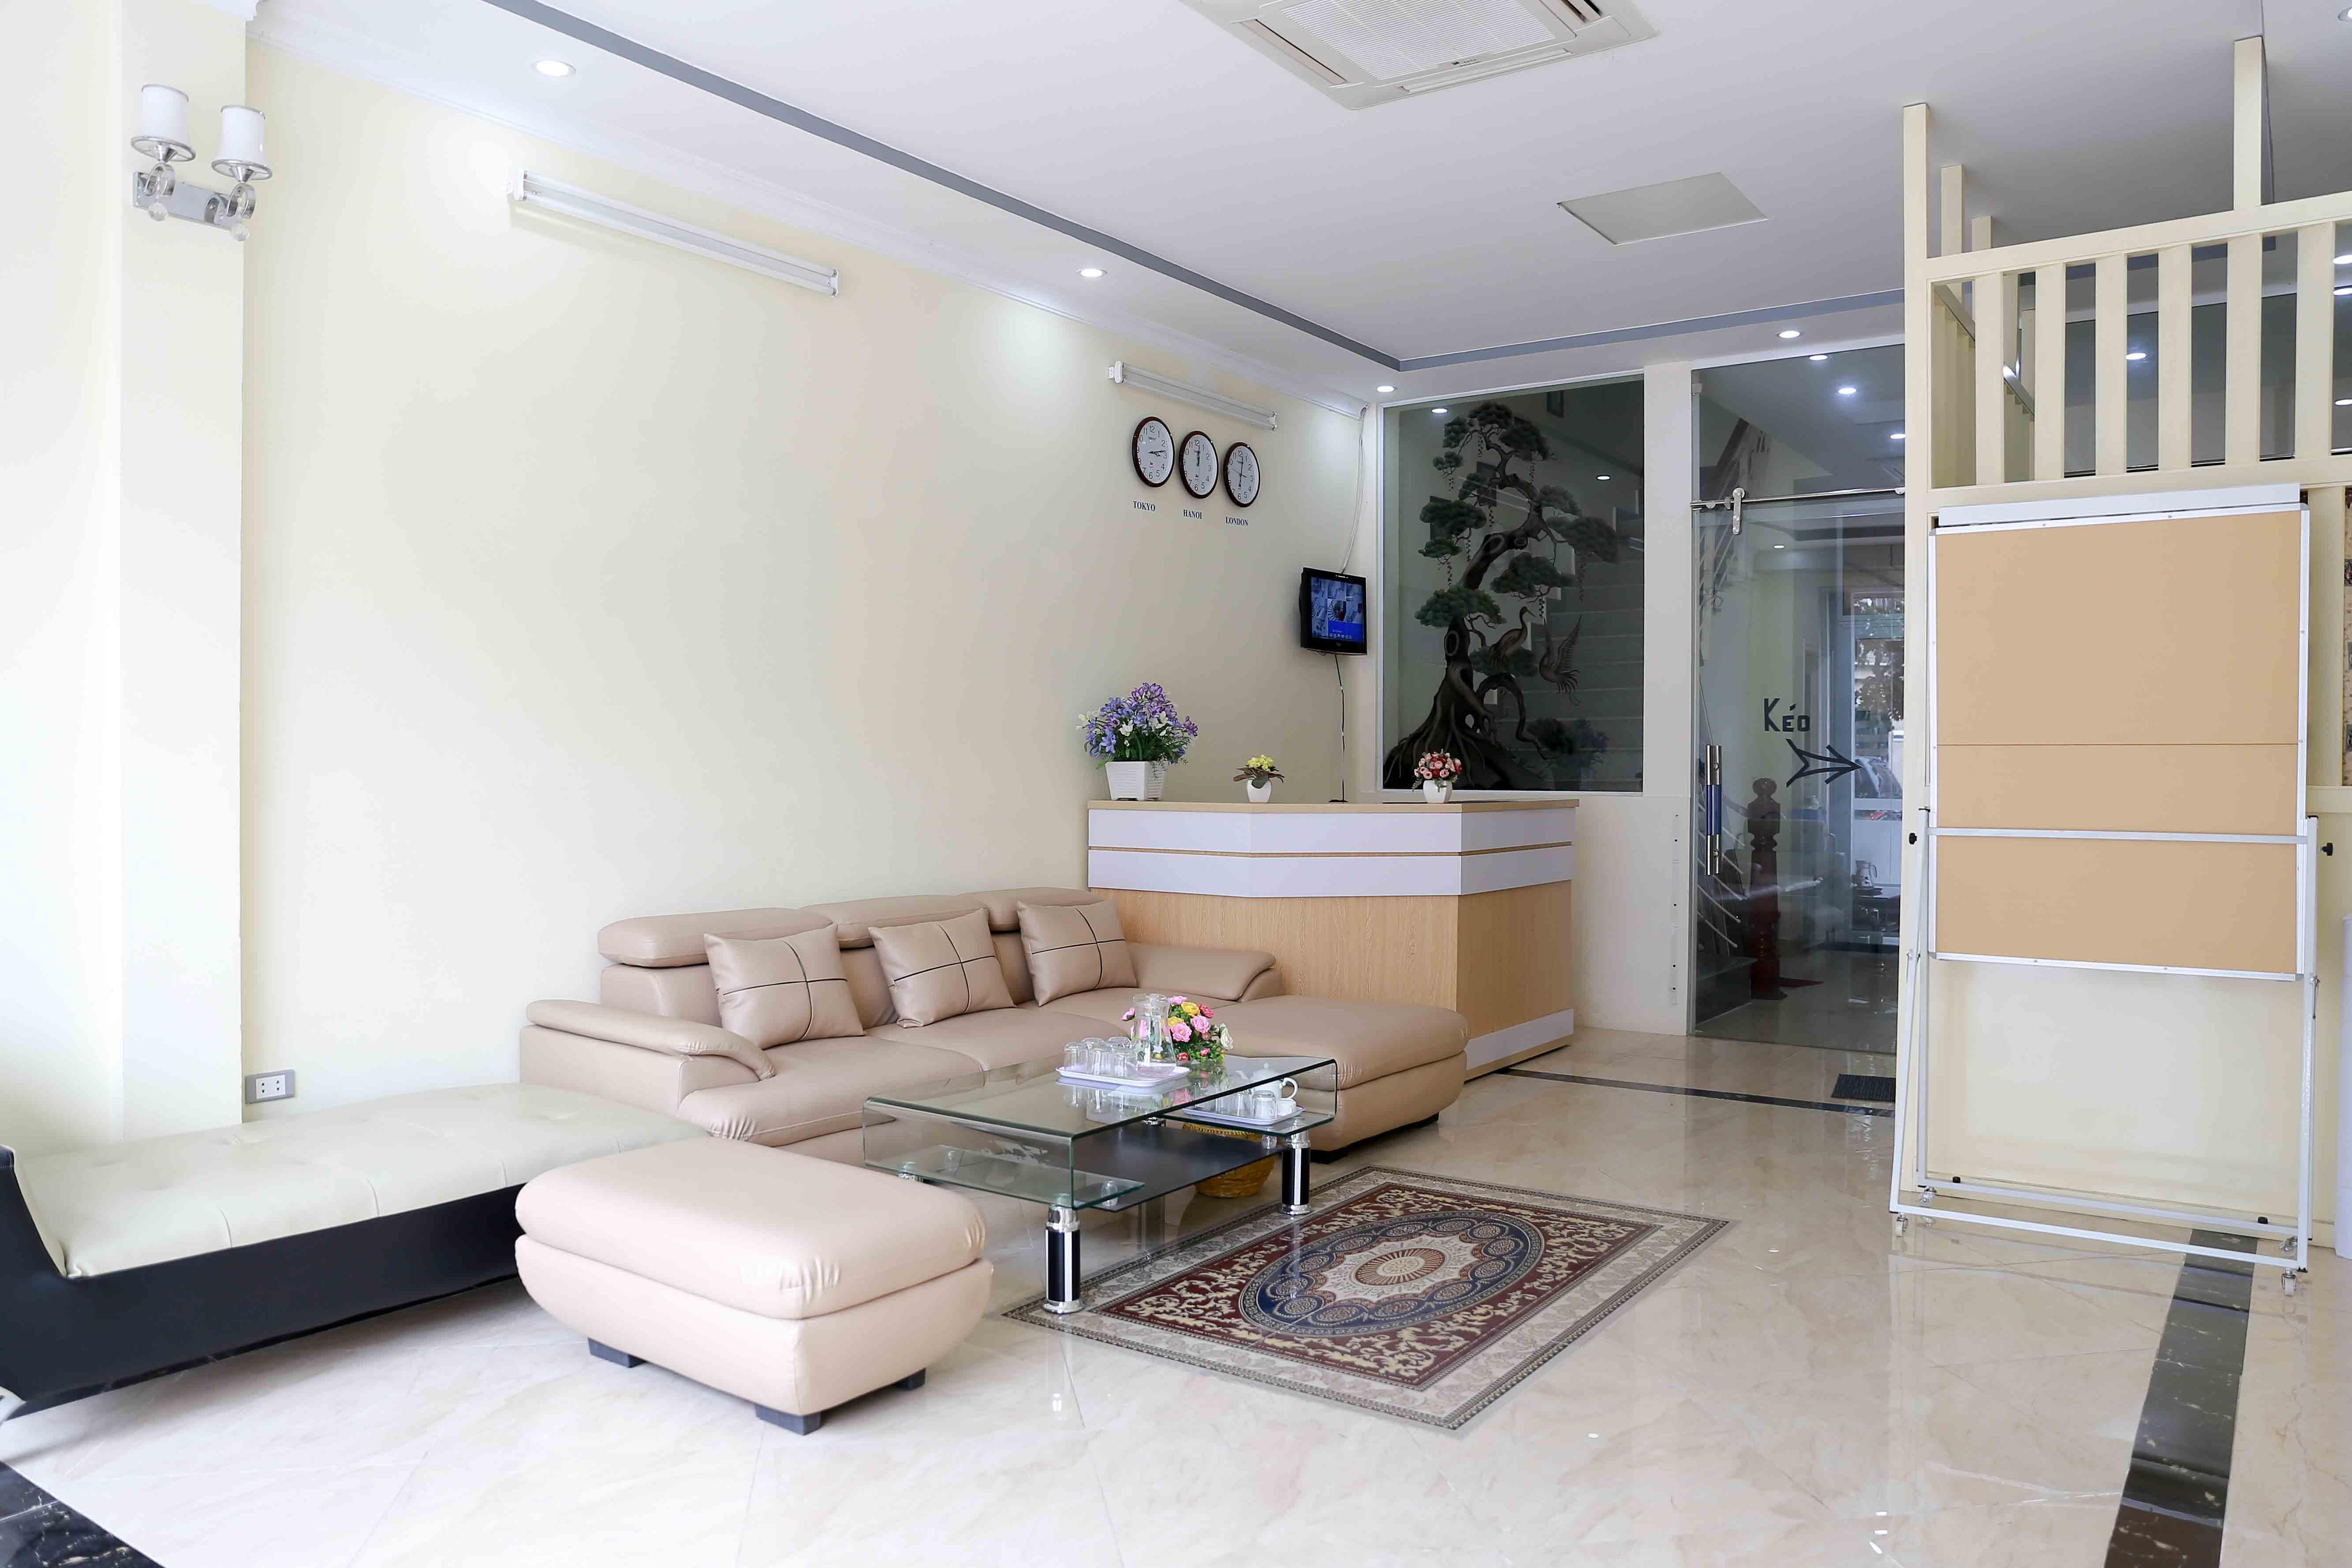 Serviced apartment in Trung Yen Cau Giay